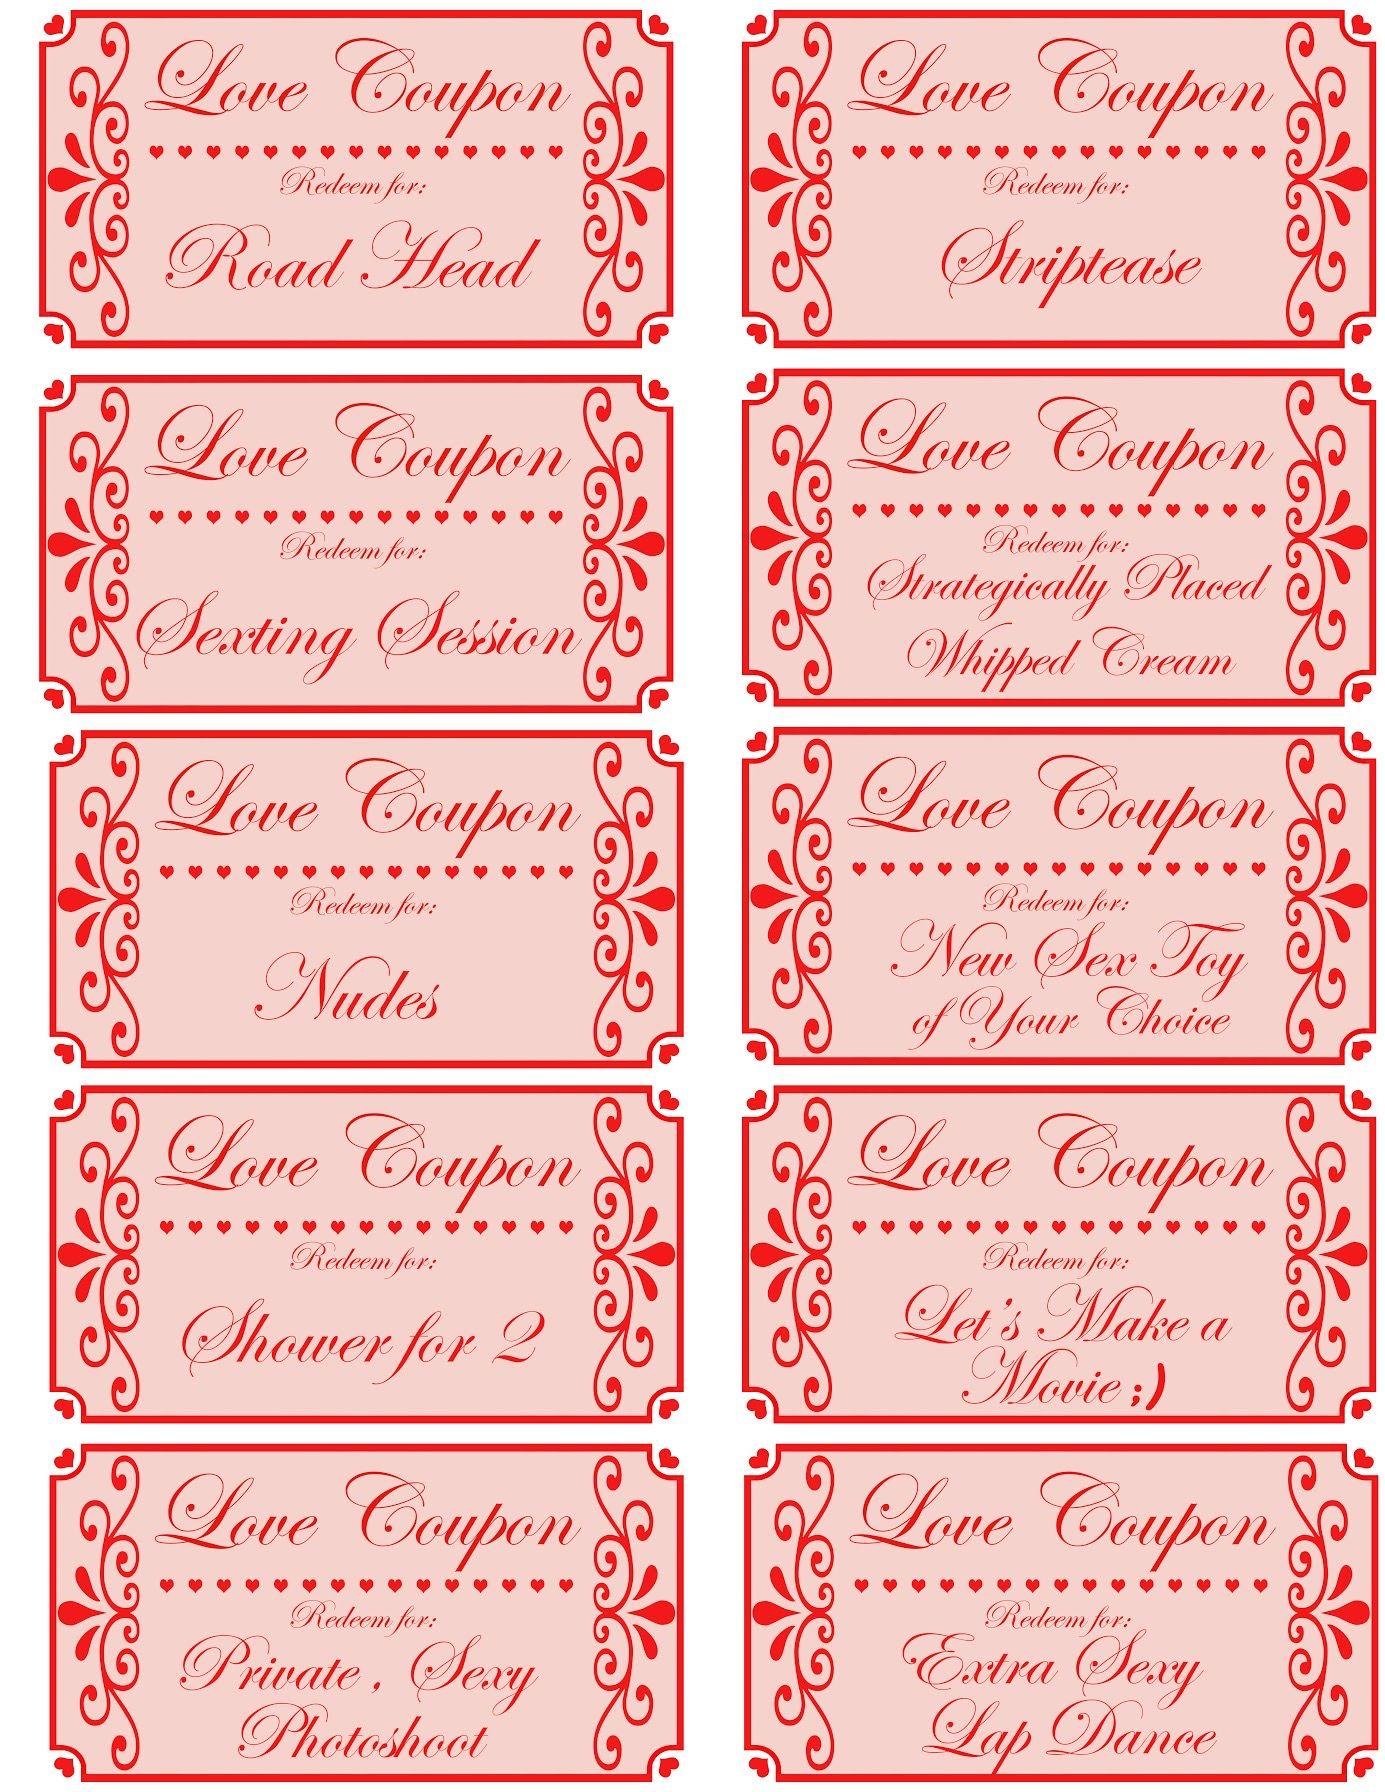 Love coupon book printable love coupons romantic coupon